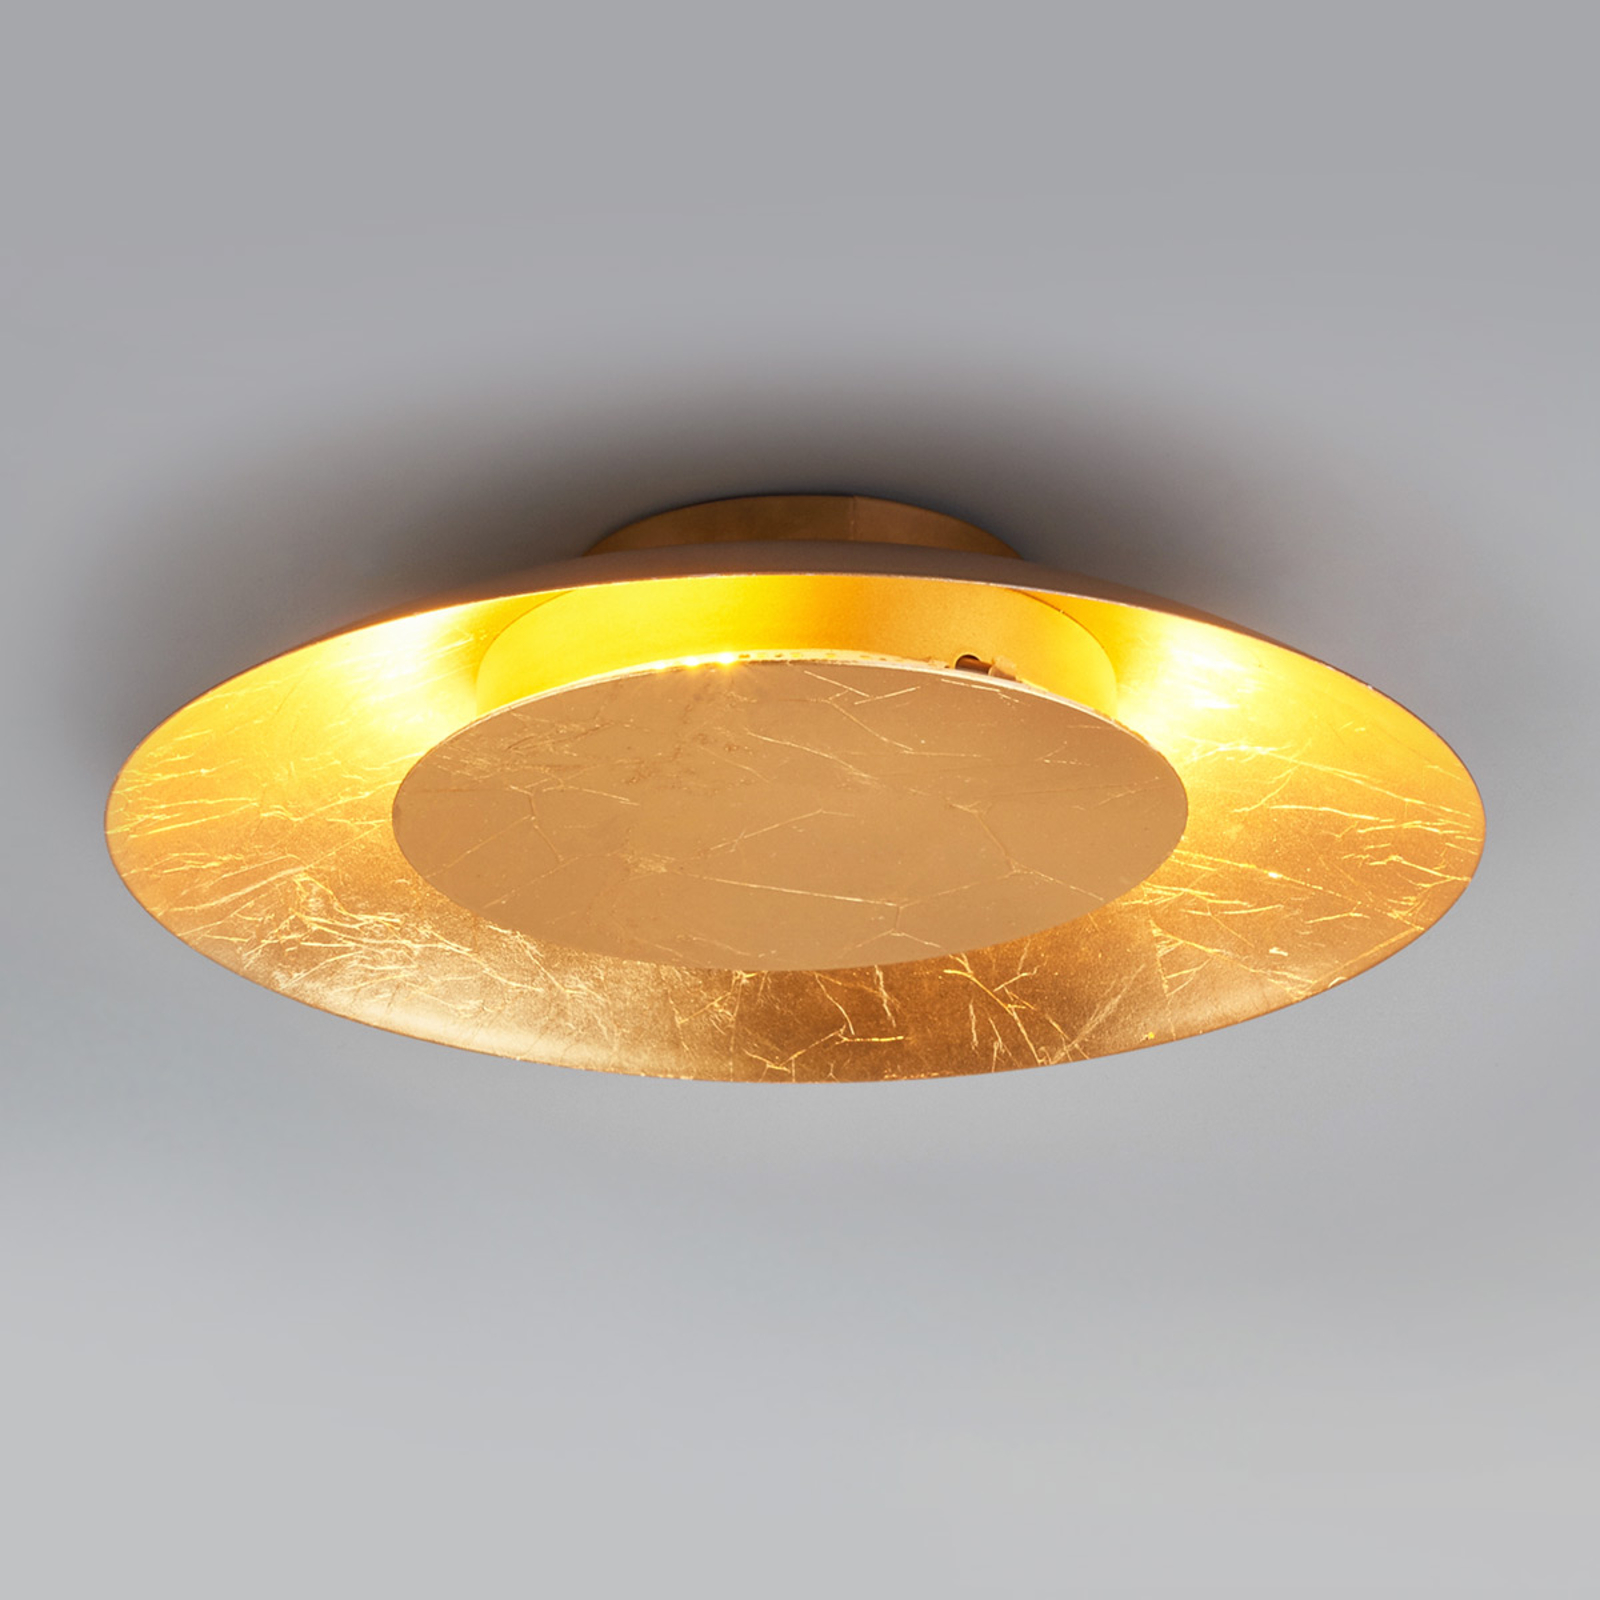 Keti LED-loftlampe i guld-look, Ø 34,5 cm